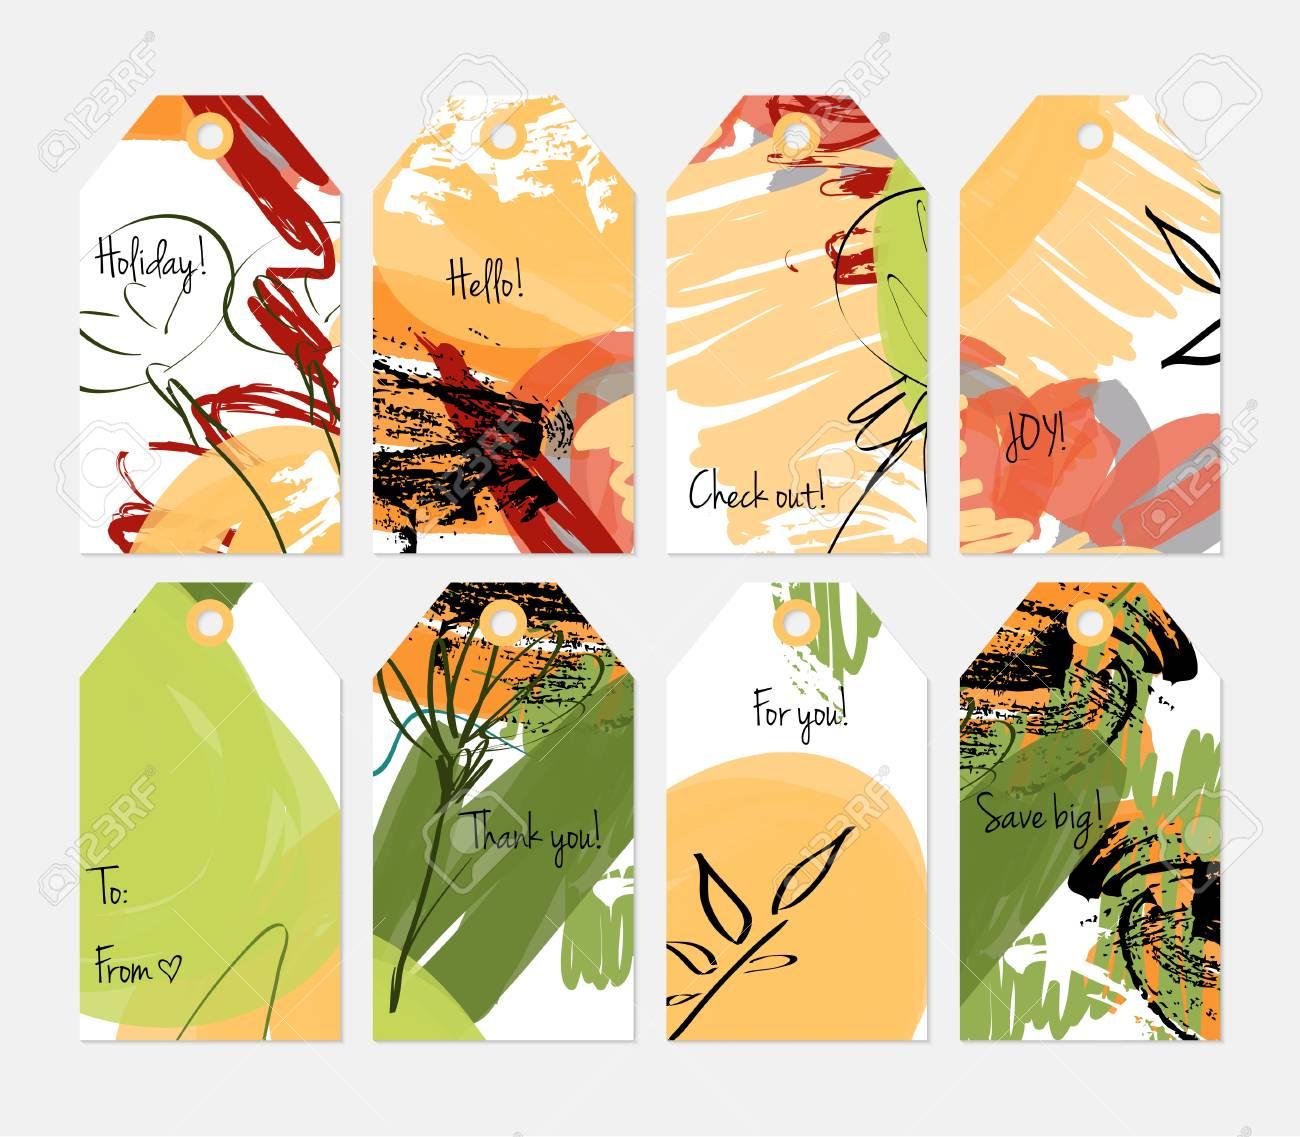 Hand drawn creative tags  Universal shopping, sales, advertising,